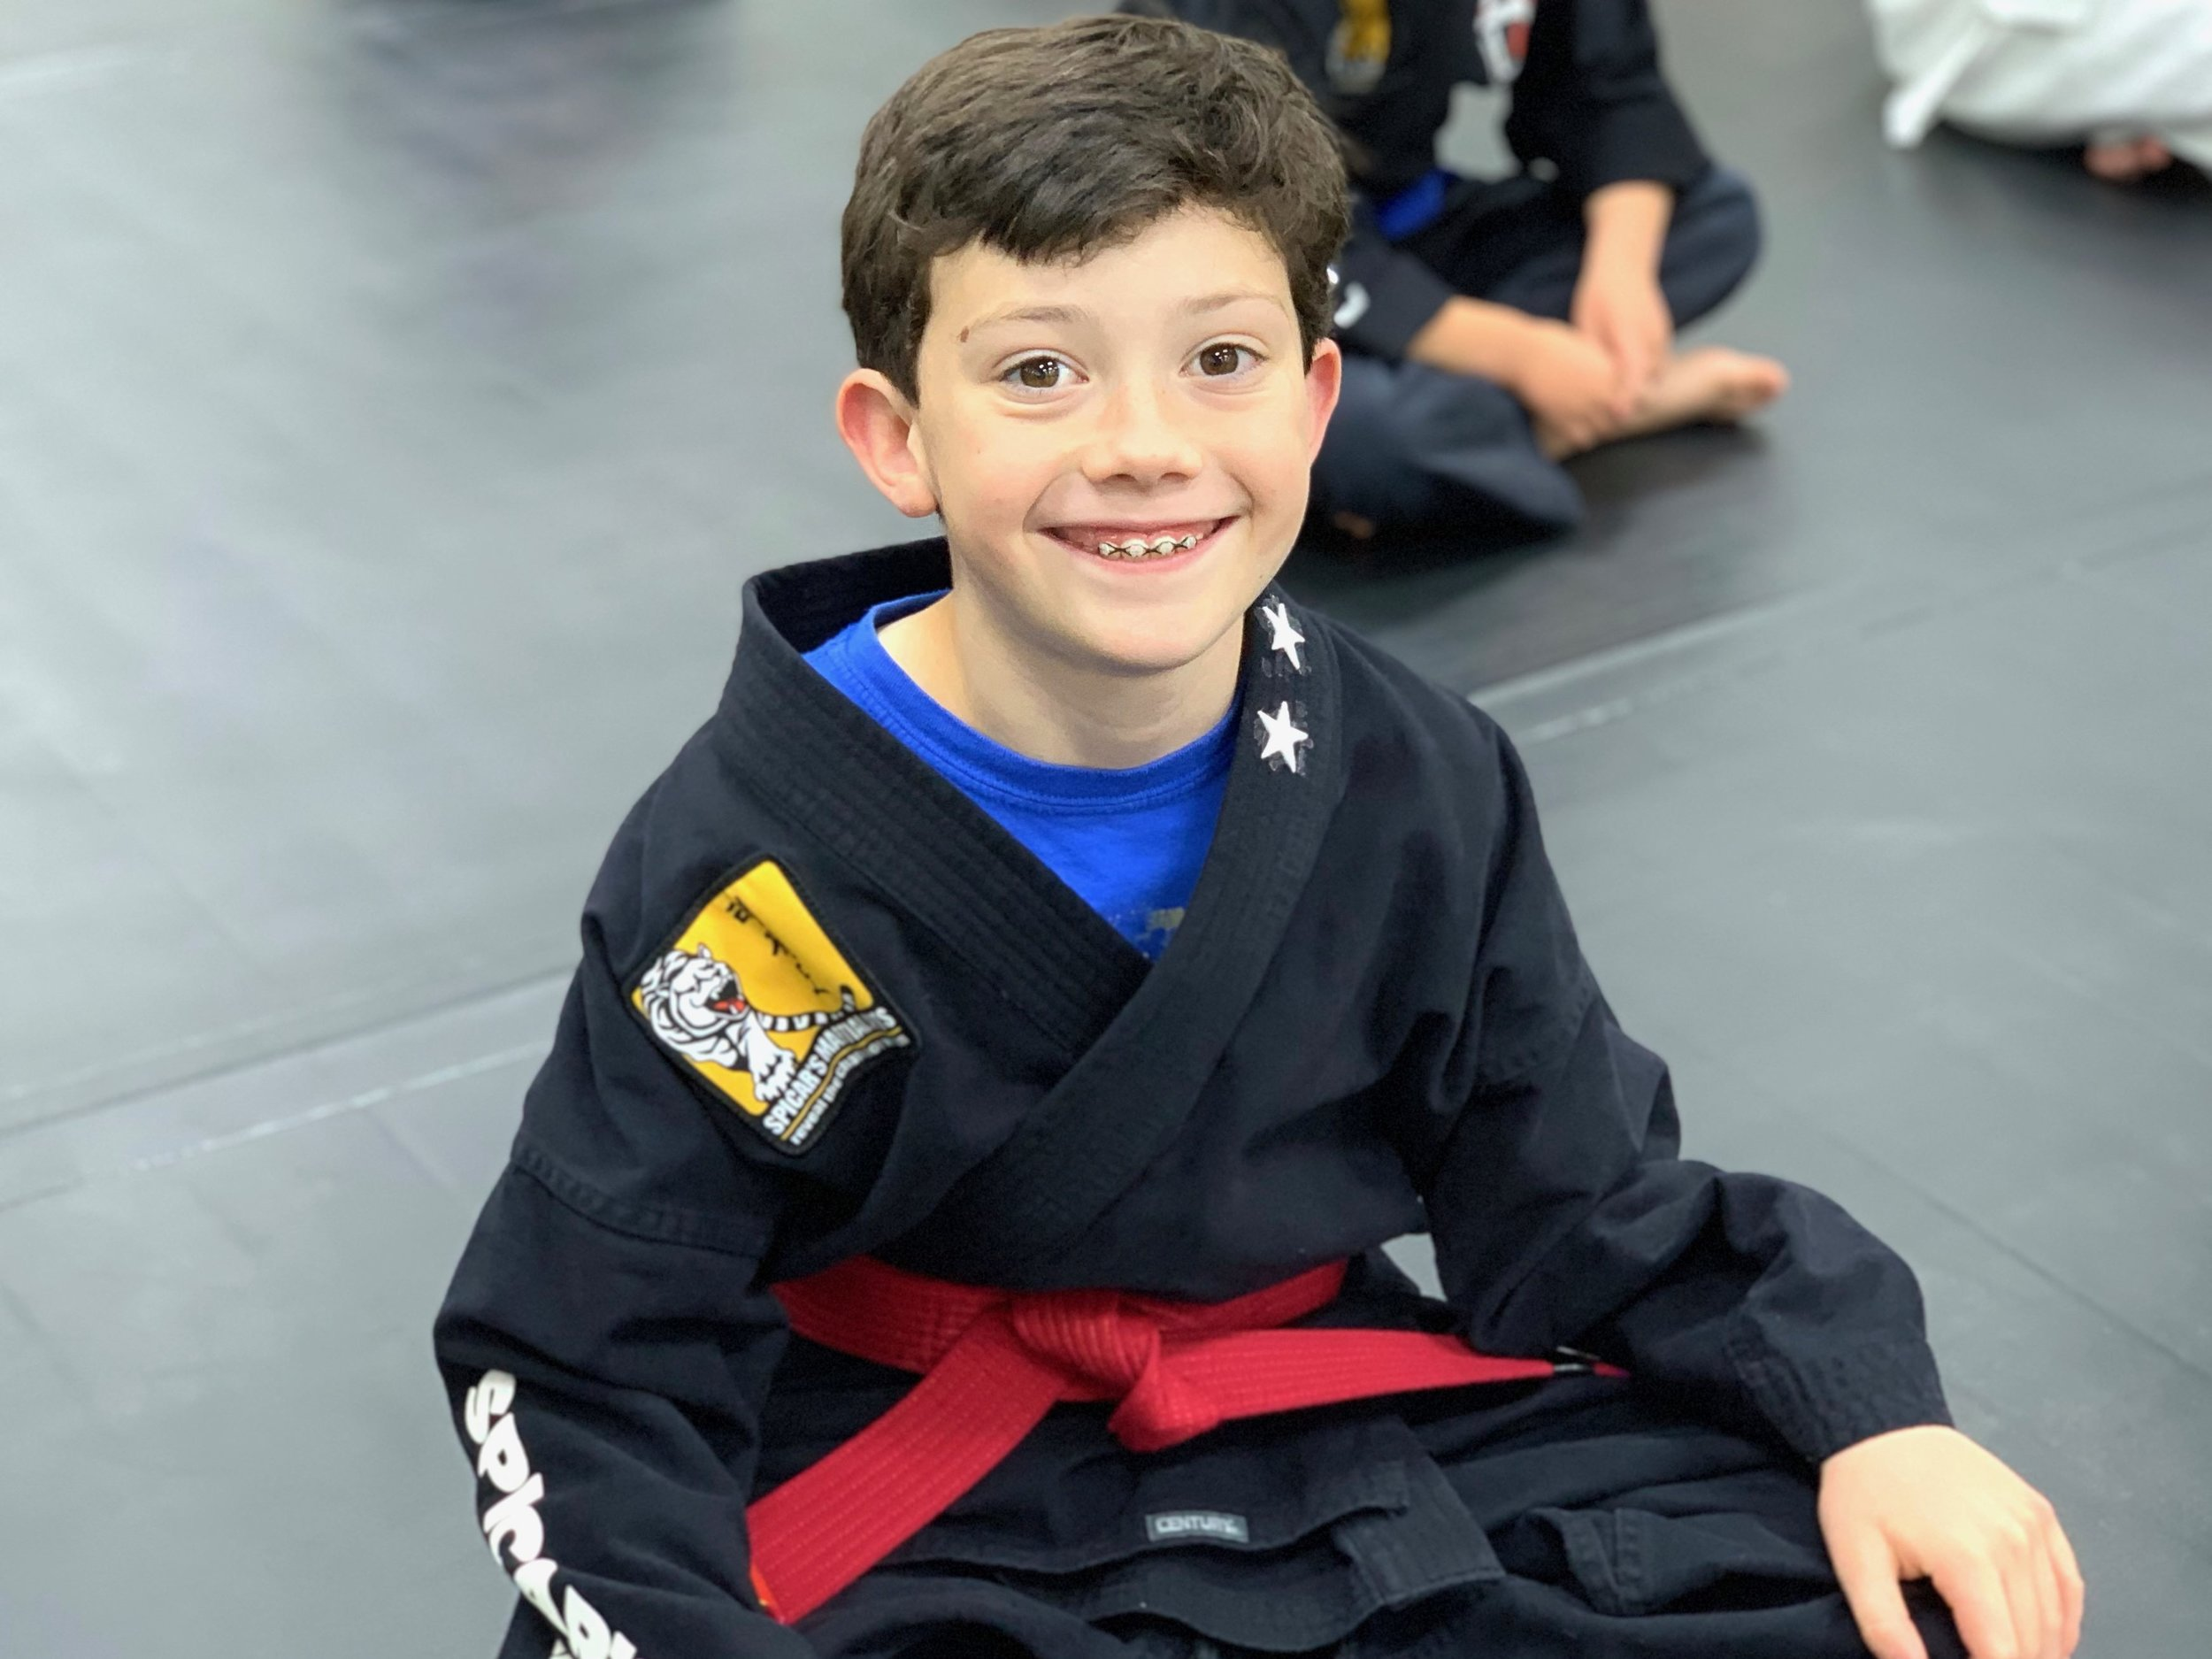 karate-kids-program-souhtlake-keller-grapevine-texas00035.jpeg